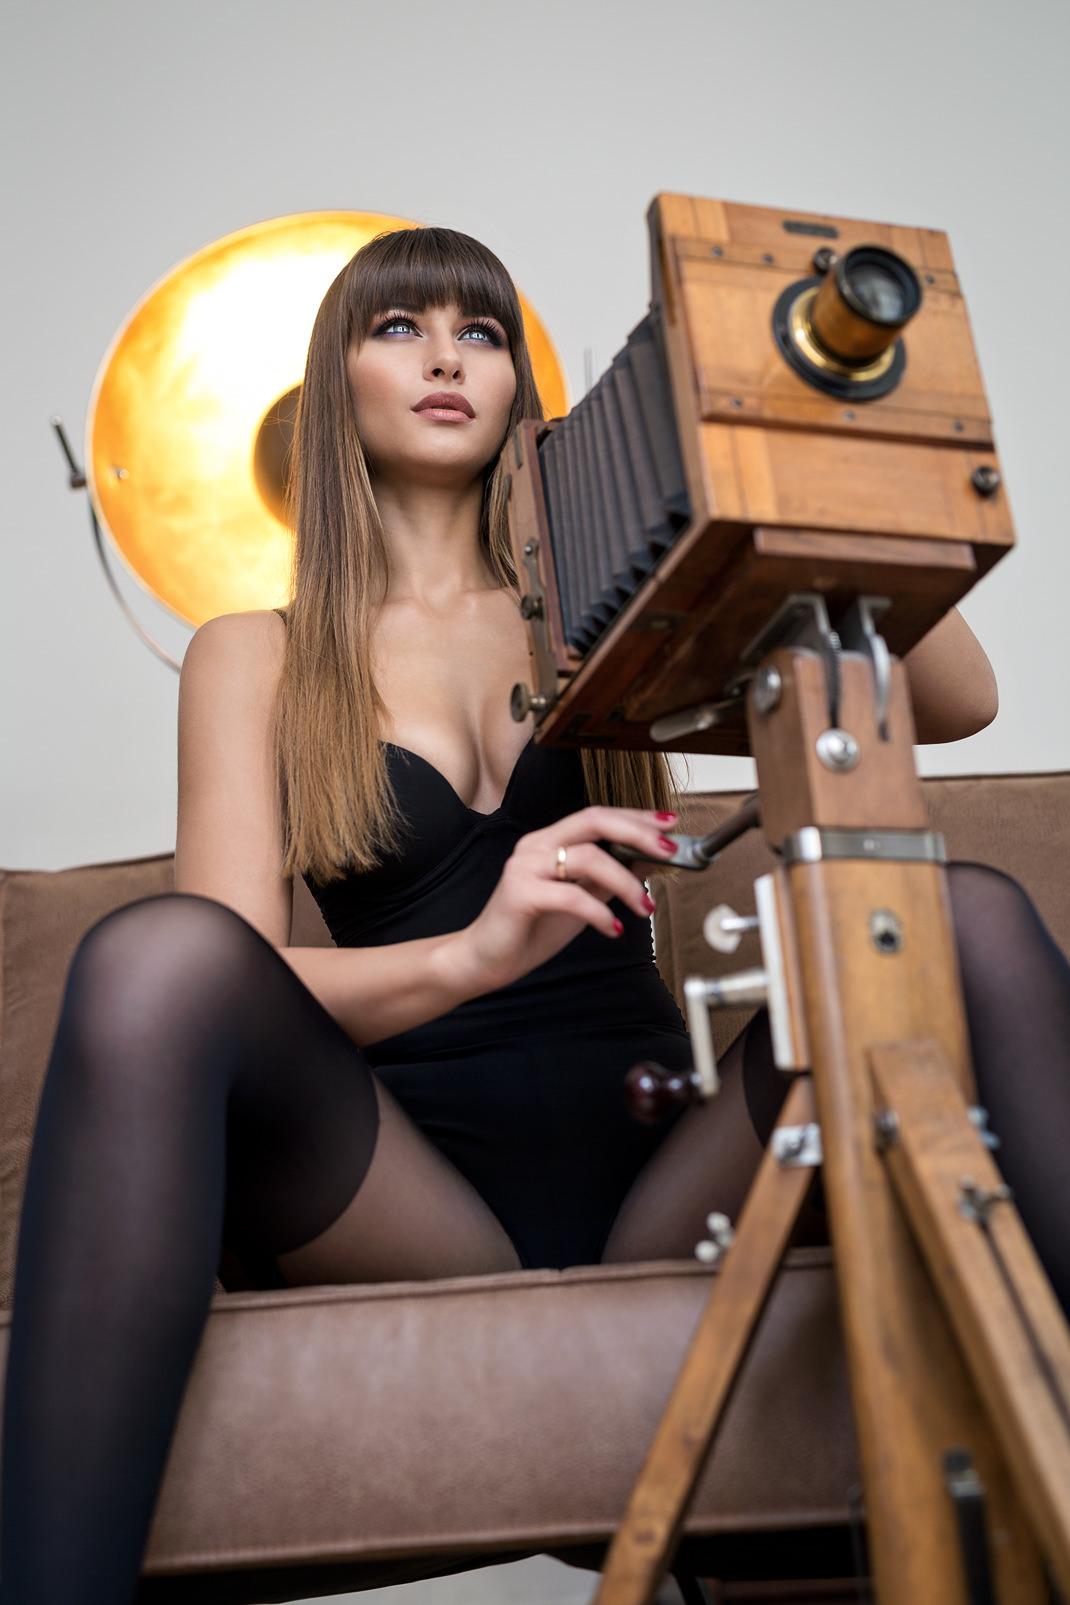 Two Beauties - Kristina & Dr. Höhn & Co Tropical Camera - Markus Hertzsch - Camera - Girl